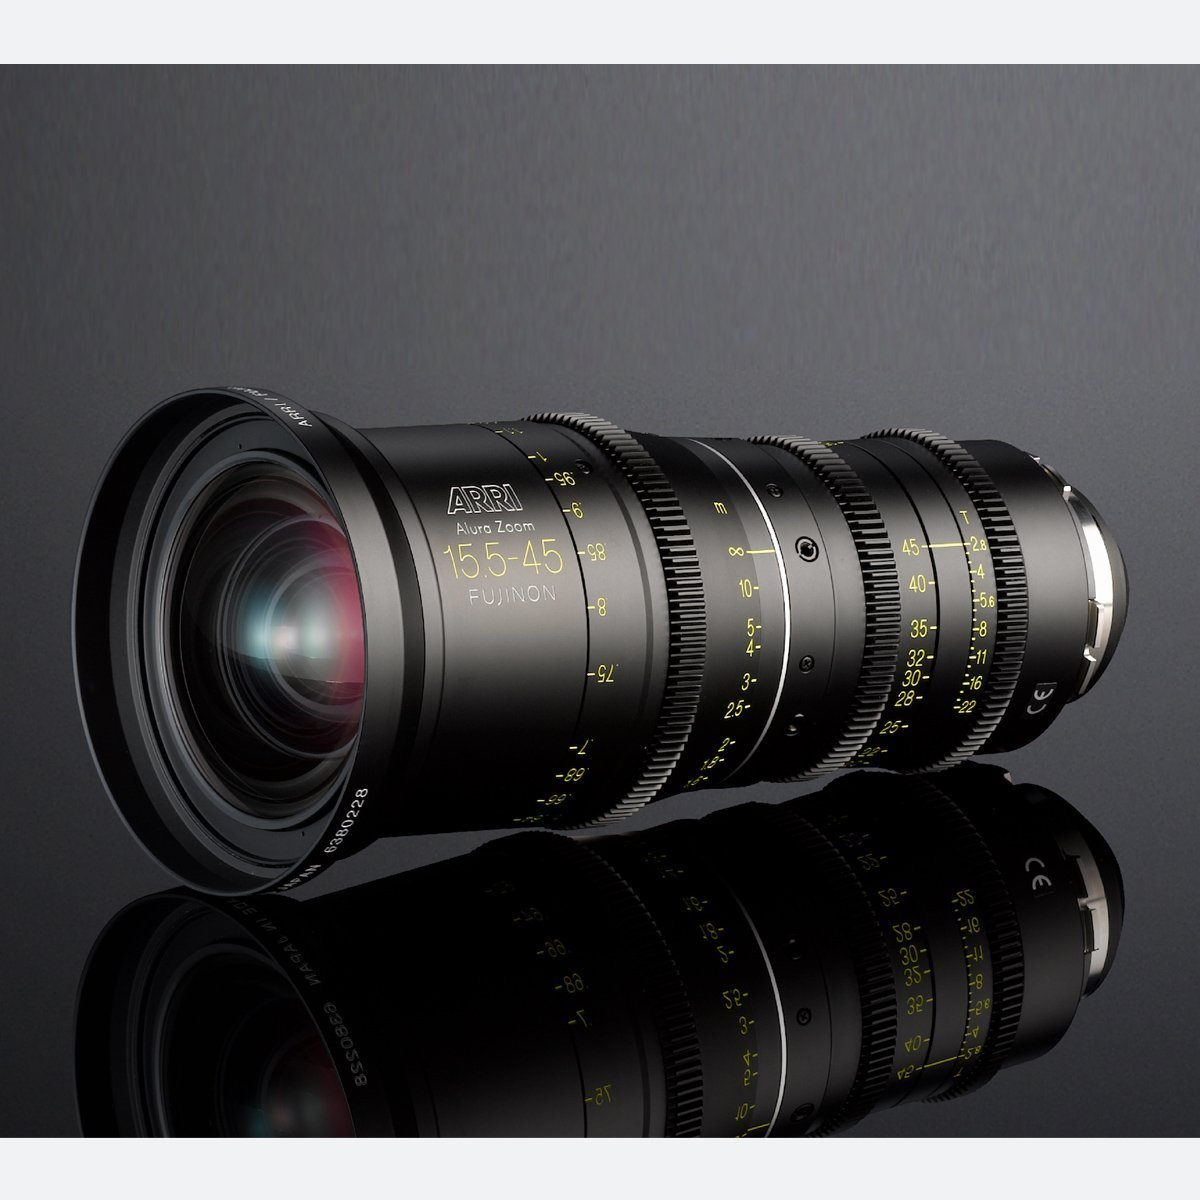 ARRI Alura Zoom 15.5-45mm